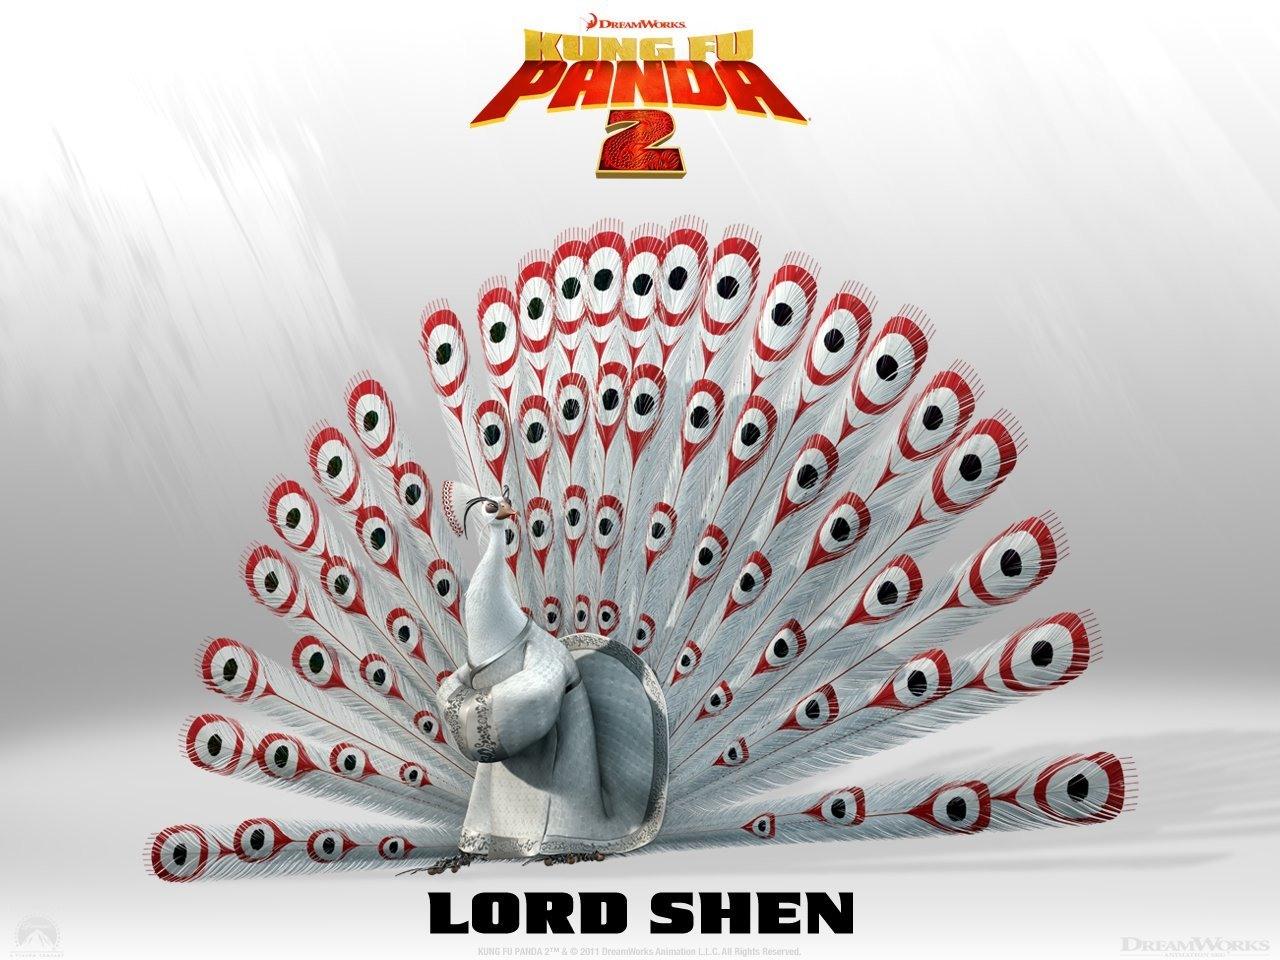 http://4.bp.blogspot.com/-En_FVcE1jAc/TeD_gBTxF9I/AAAAAAAAA1o/msiI085AN7g/s1600/Kung-Fu-Panda-2-Wallpaper-Lord-Shen.jpg